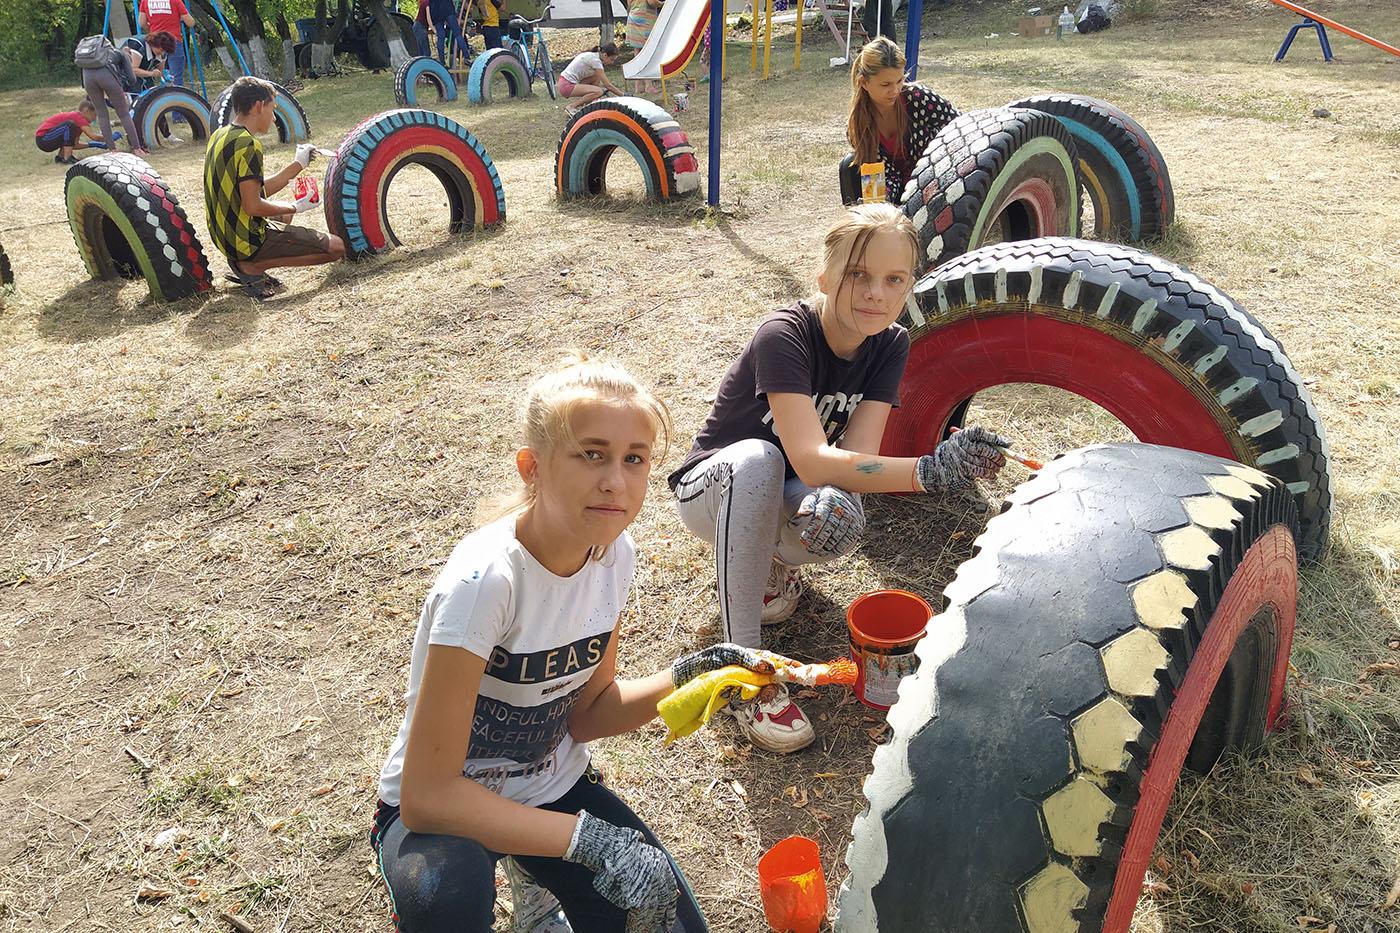 В Бугаёвке активисты ОД «Мир Луганщине» покрасили детскую площадку3